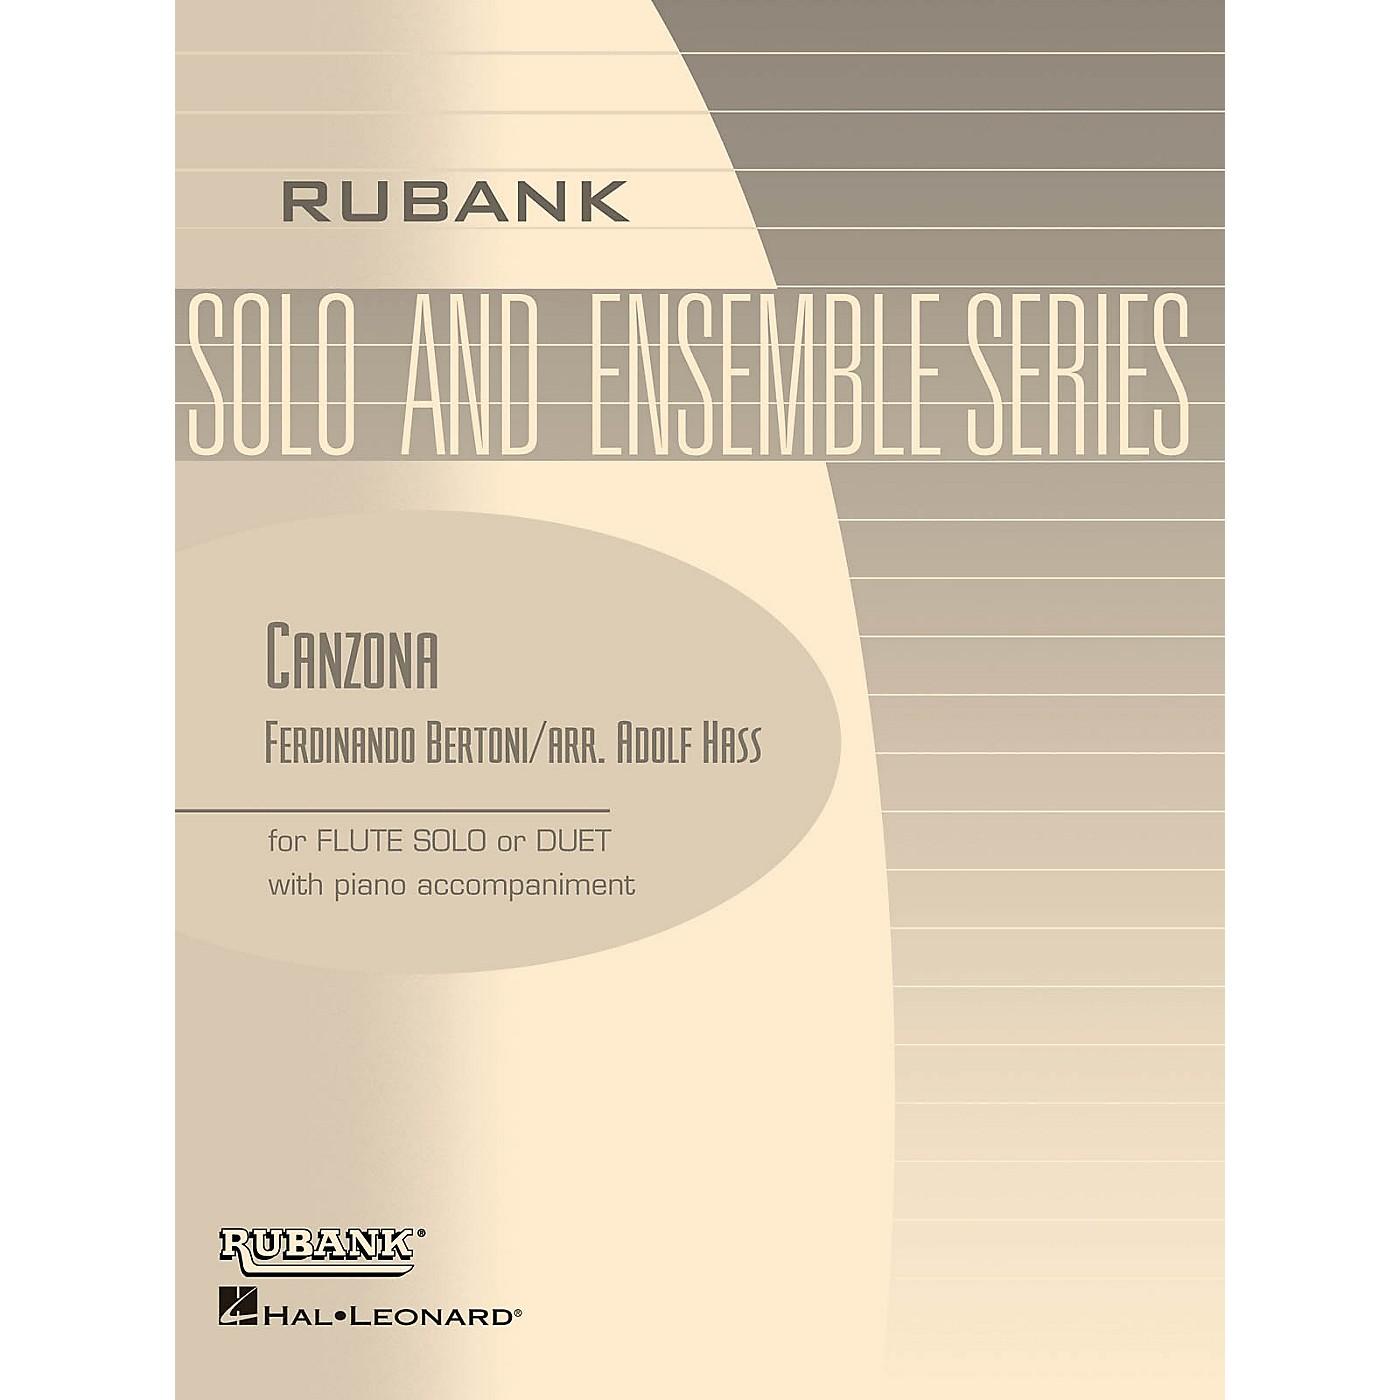 Rubank Publications Canzona (Flute Solo/Duet with Piano - Grade 2.5) Rubank Solo/Ensemble Sheet Series thumbnail